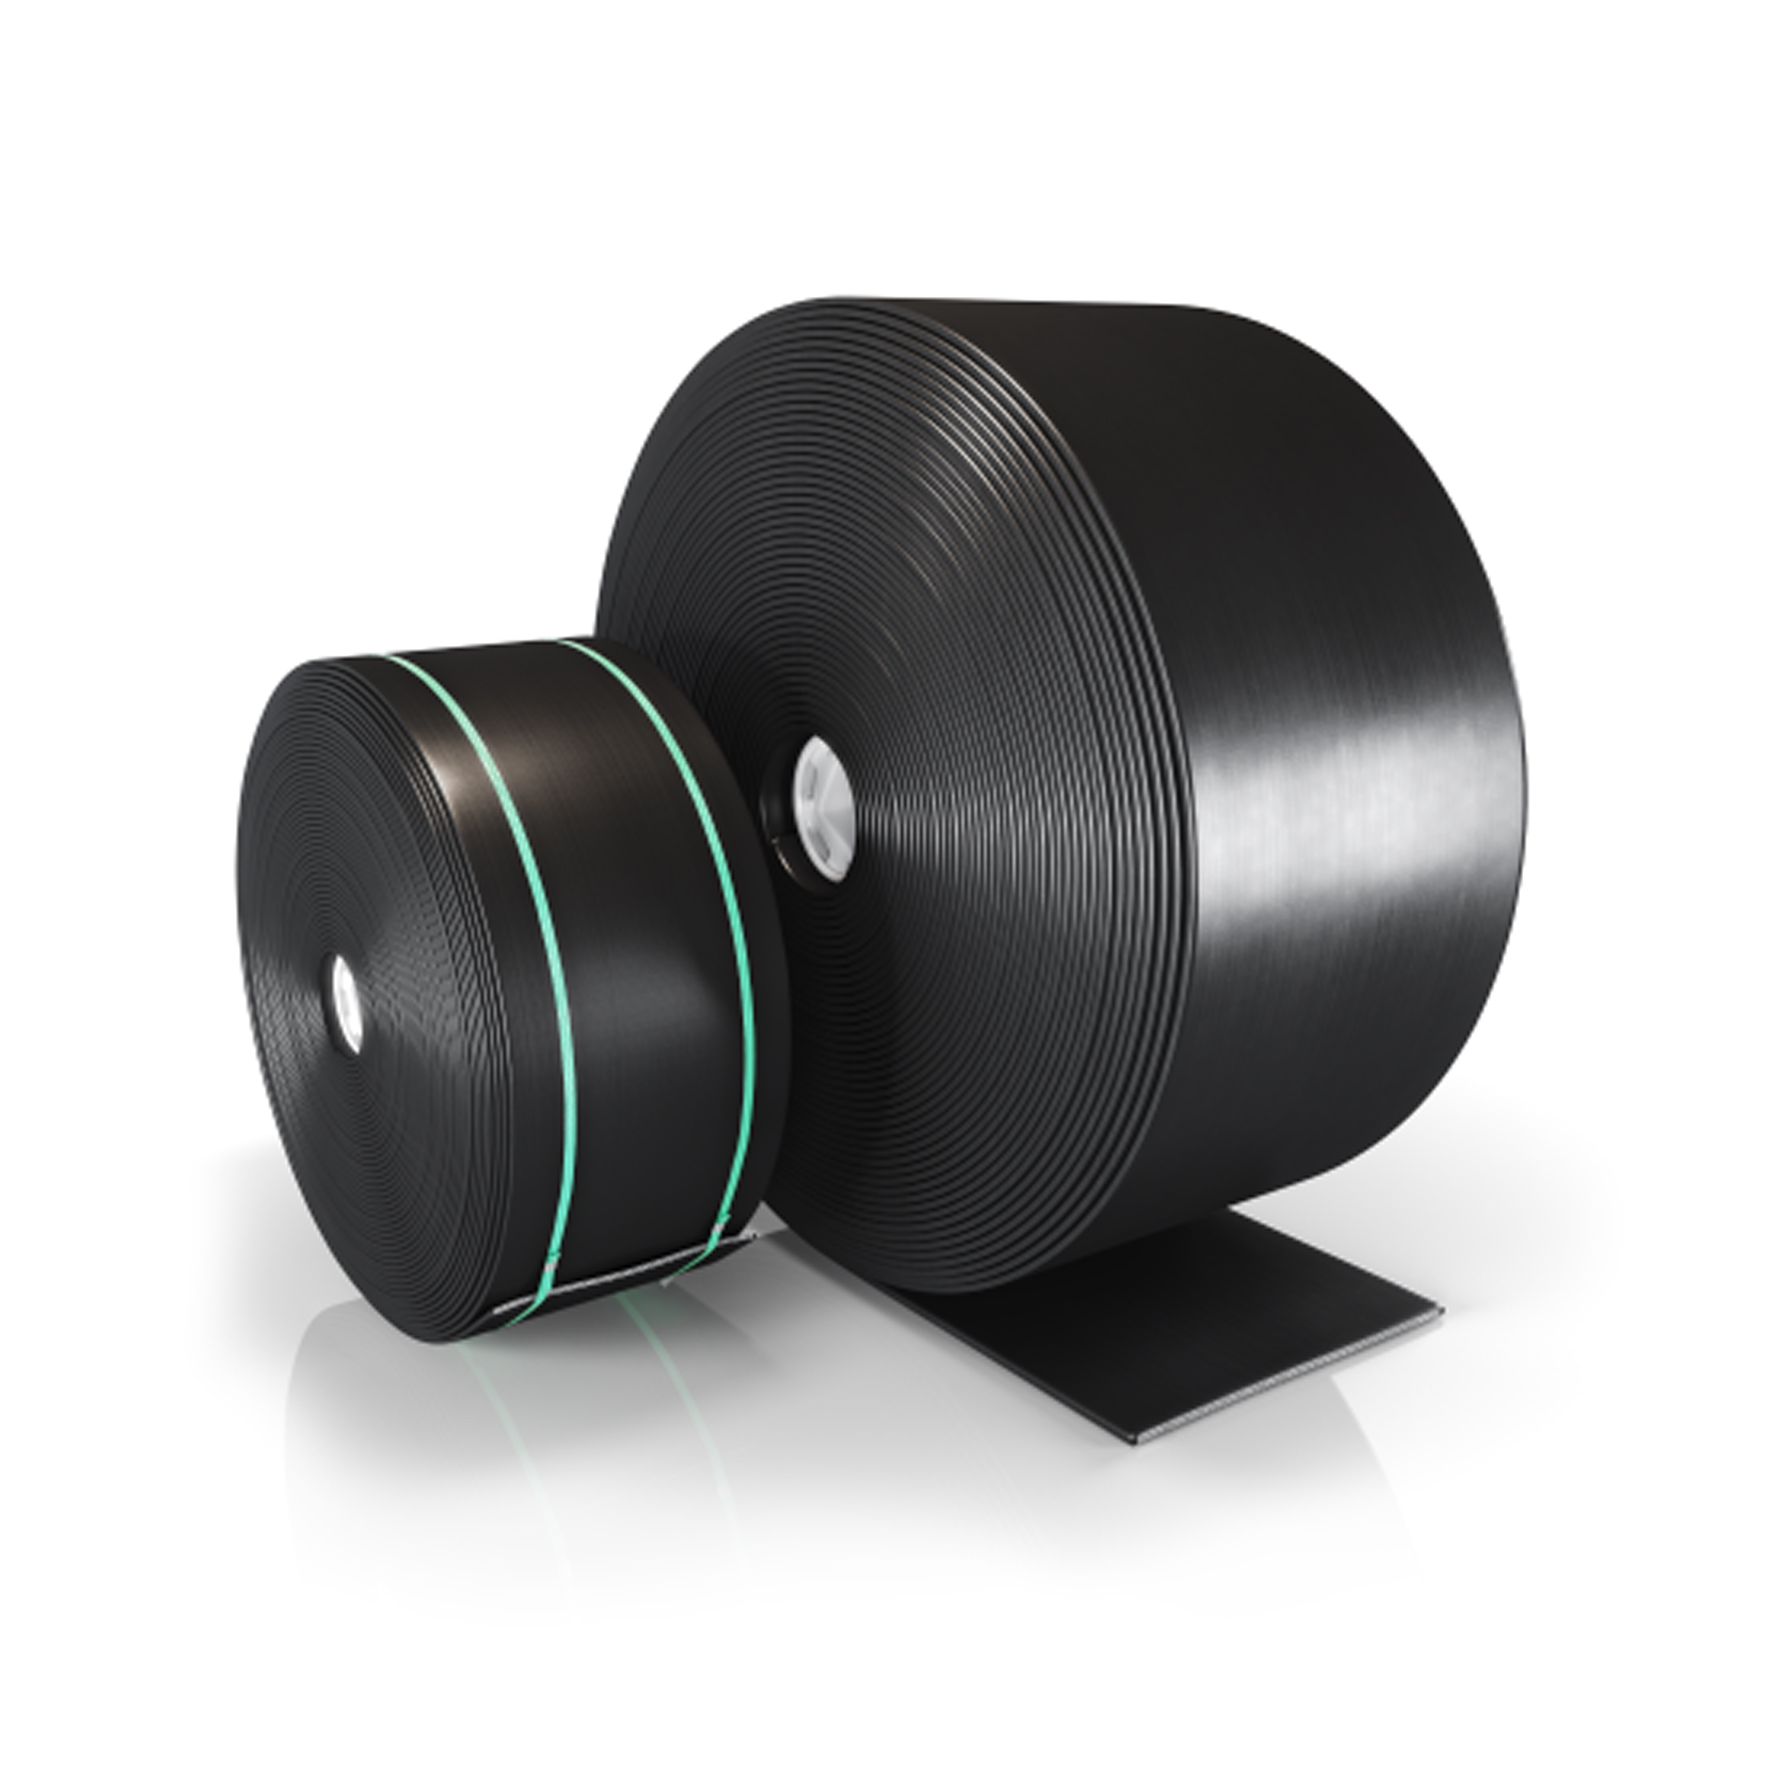 лента транспортерная толщина 10 мм